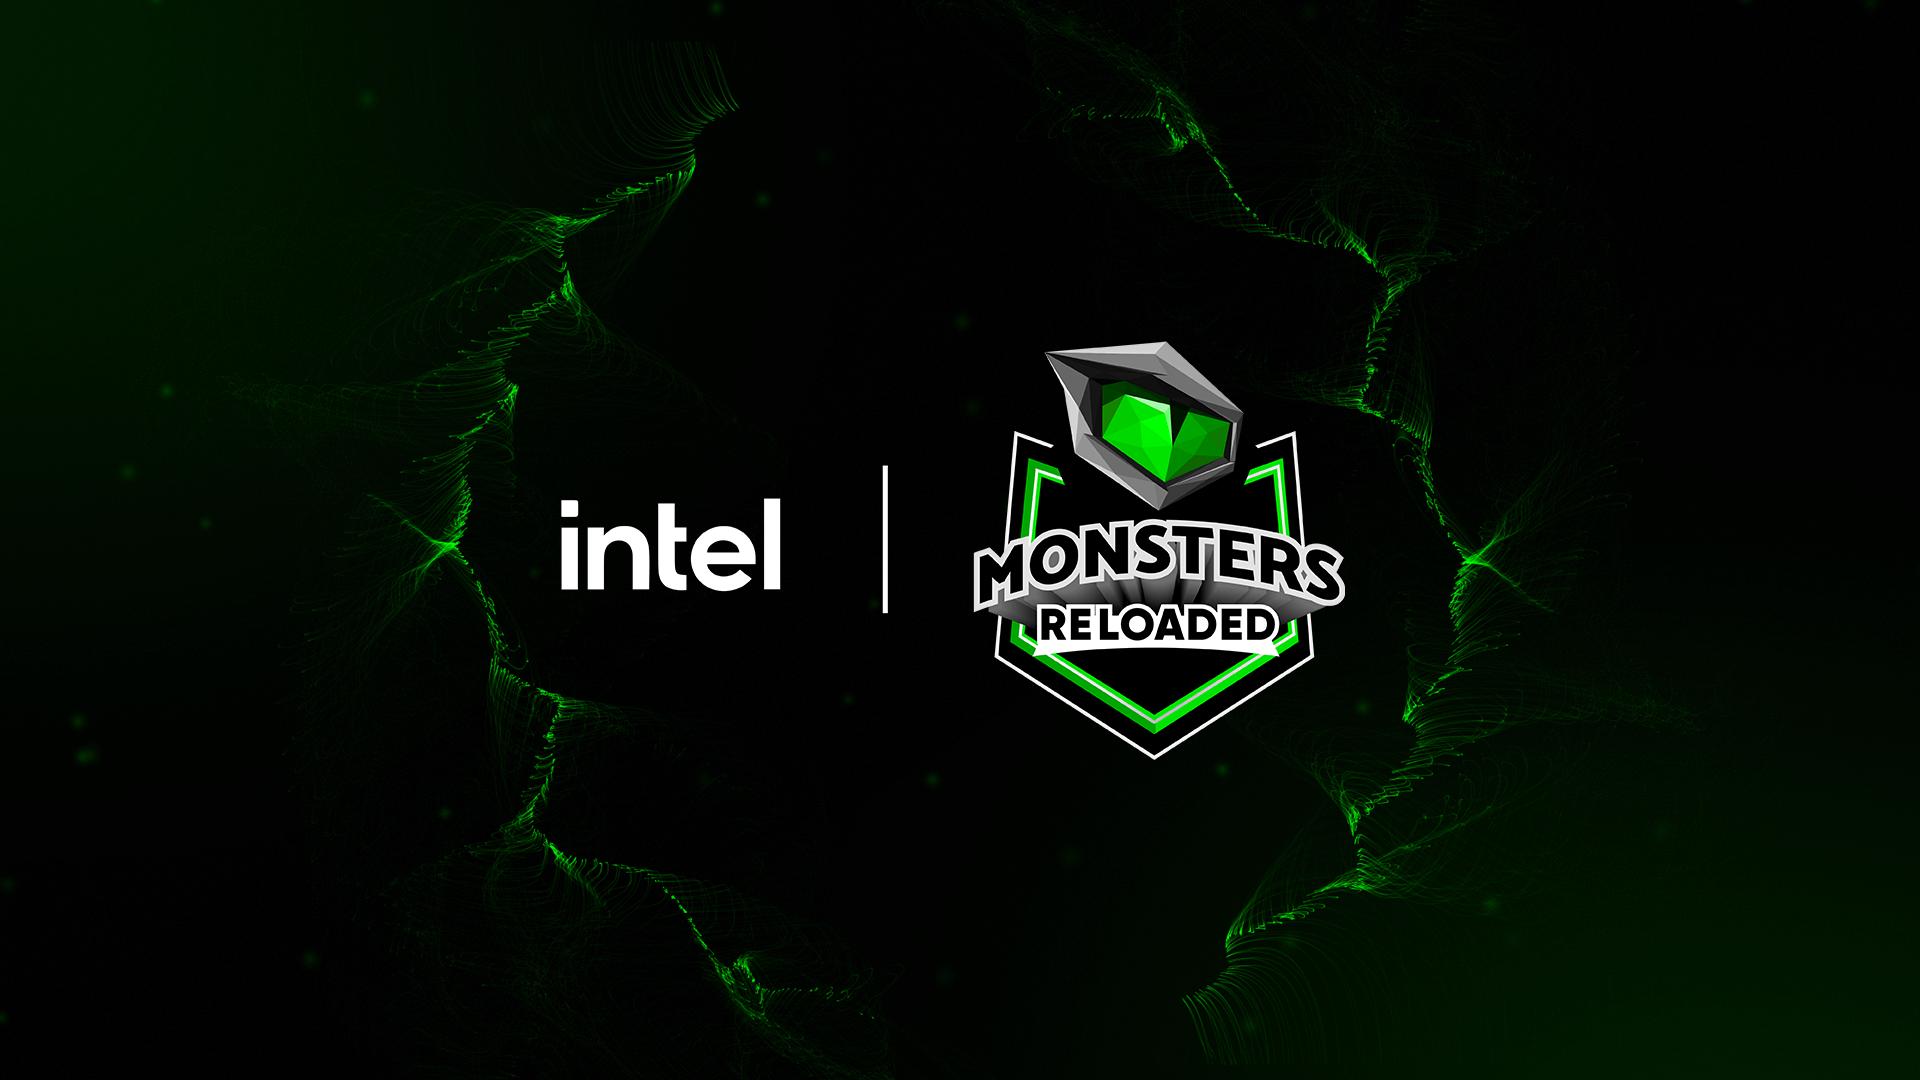 1625813920 Intel Monsters Reloaded